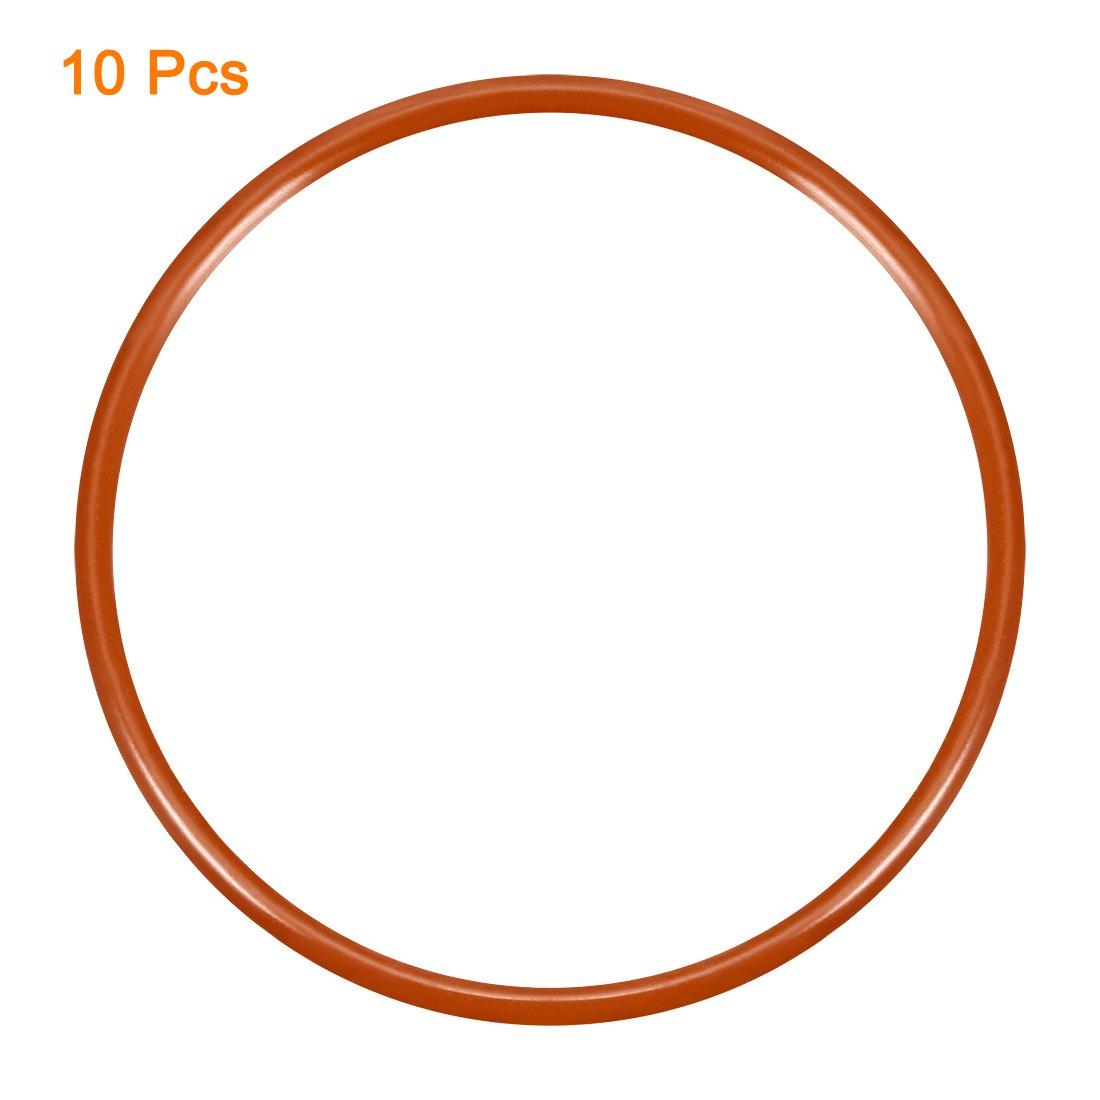 60mm Outside Diameter 2.4mm Width sourcingmap Silicone O-Ring 55.2mm Inner Diameter 10PCS VMQ Seal Rings Sealing Gasket Red